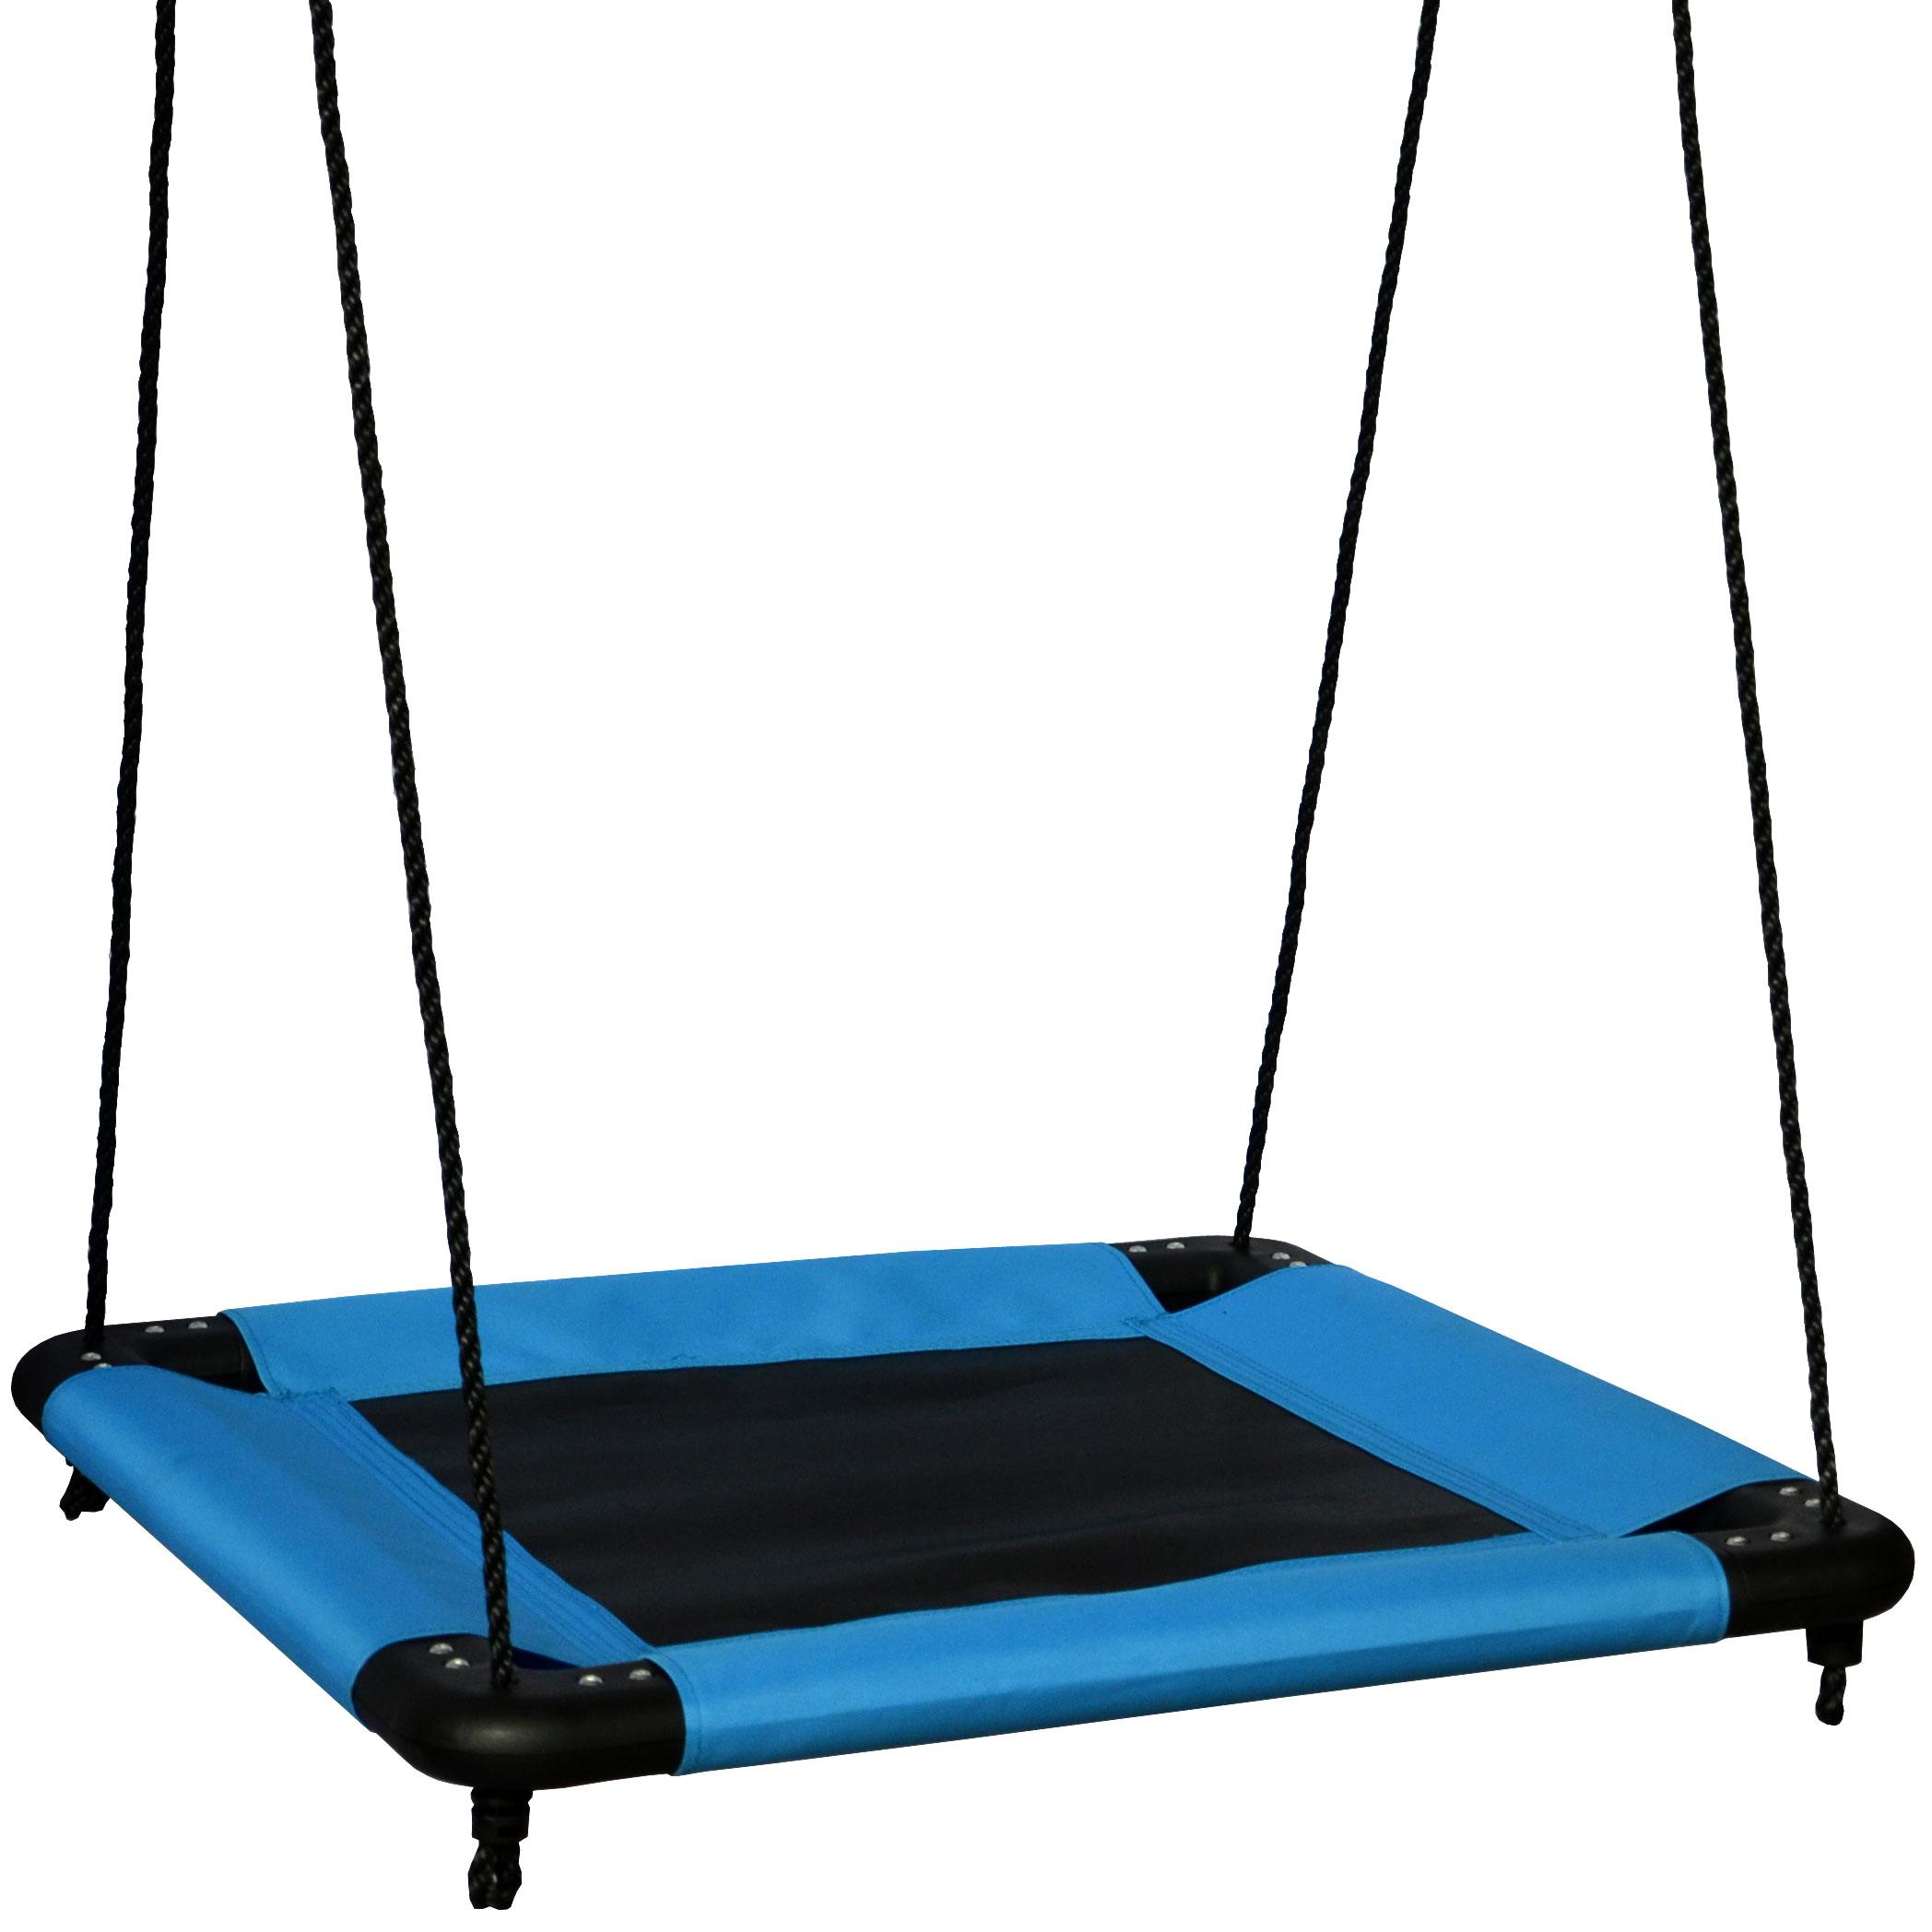 80cm Blue Square Nest Swing Heavenly Hammocks